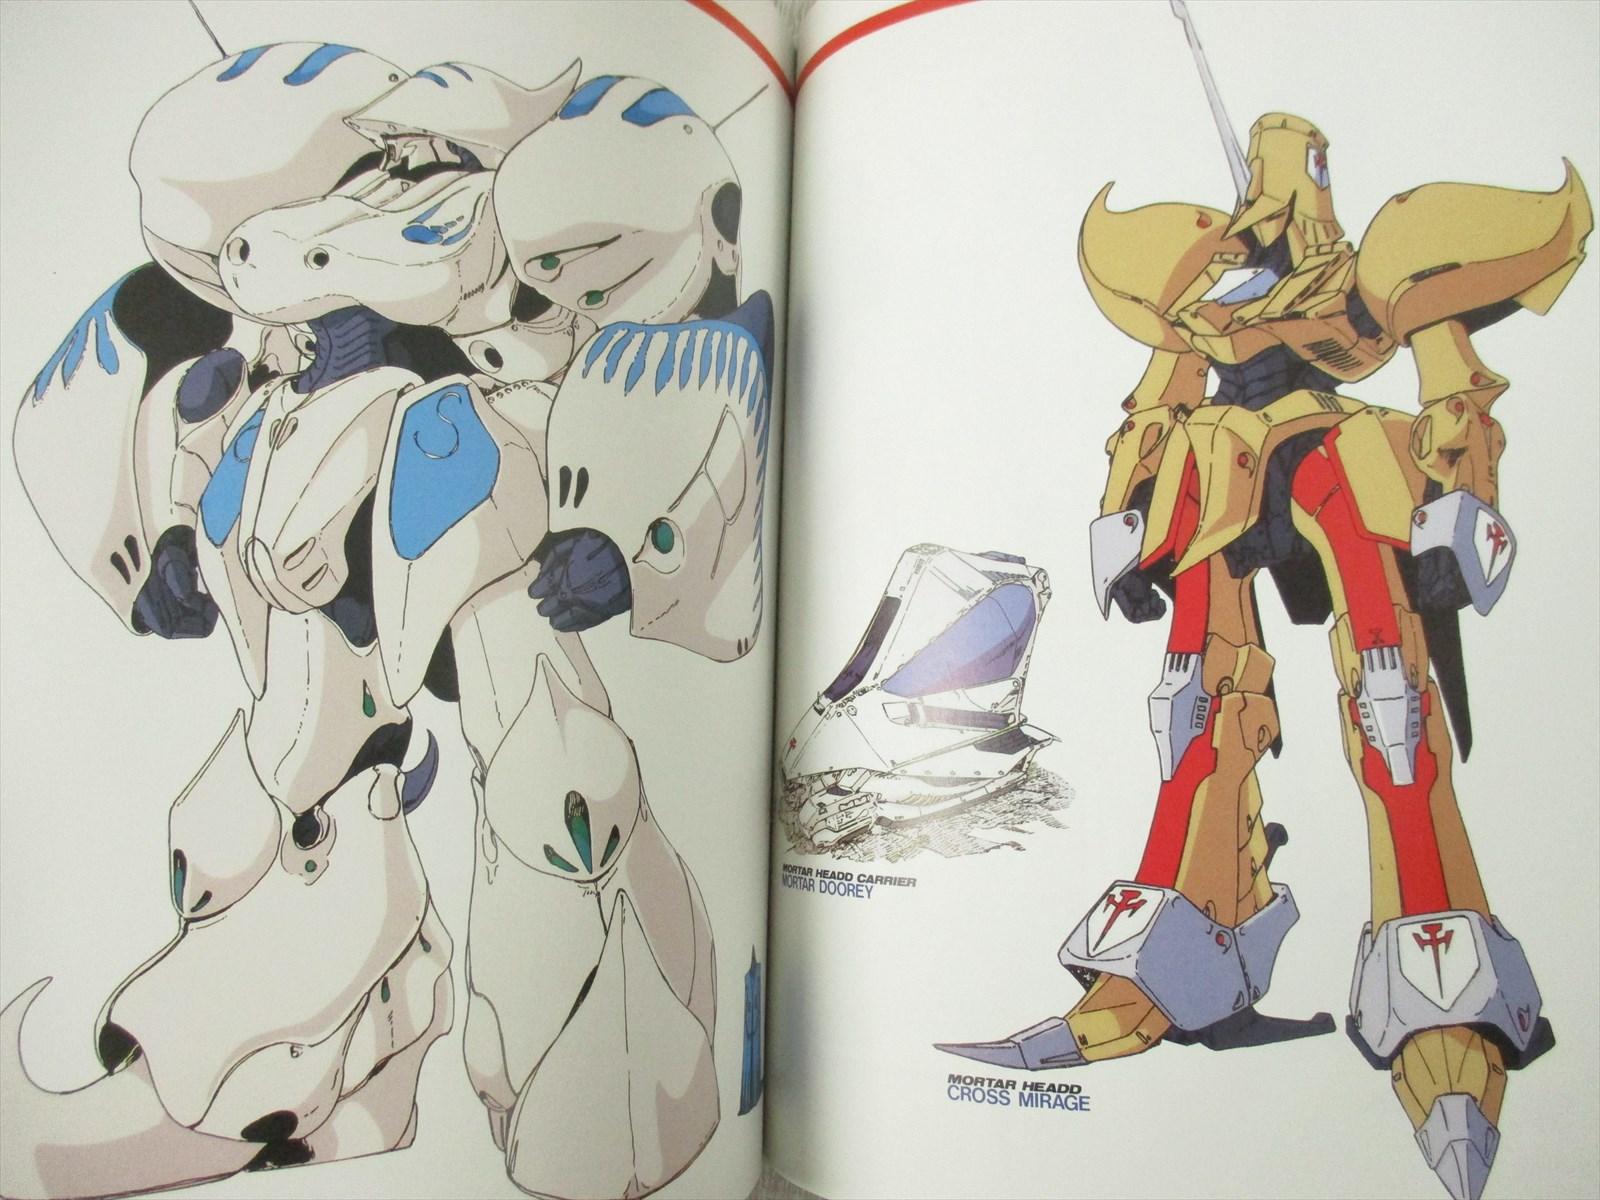 FIVE STAR STORIES FSS Character Art Book MIRAGE MAMORU NAGANO Revised Book 2x